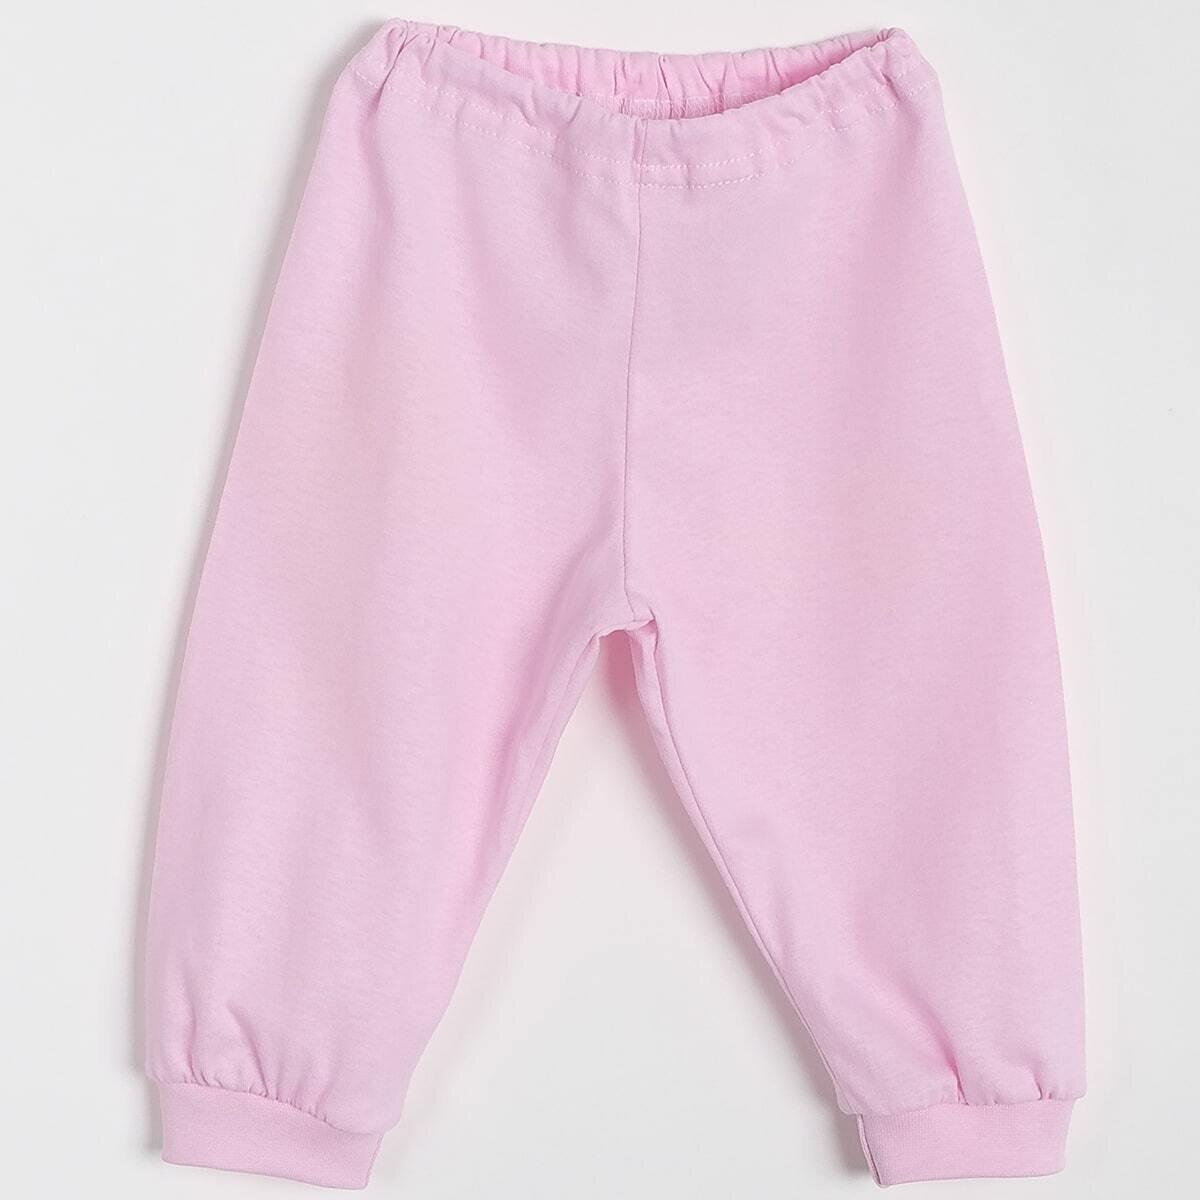 Штанишки на манжетах, тонкий трикотаж, розовый